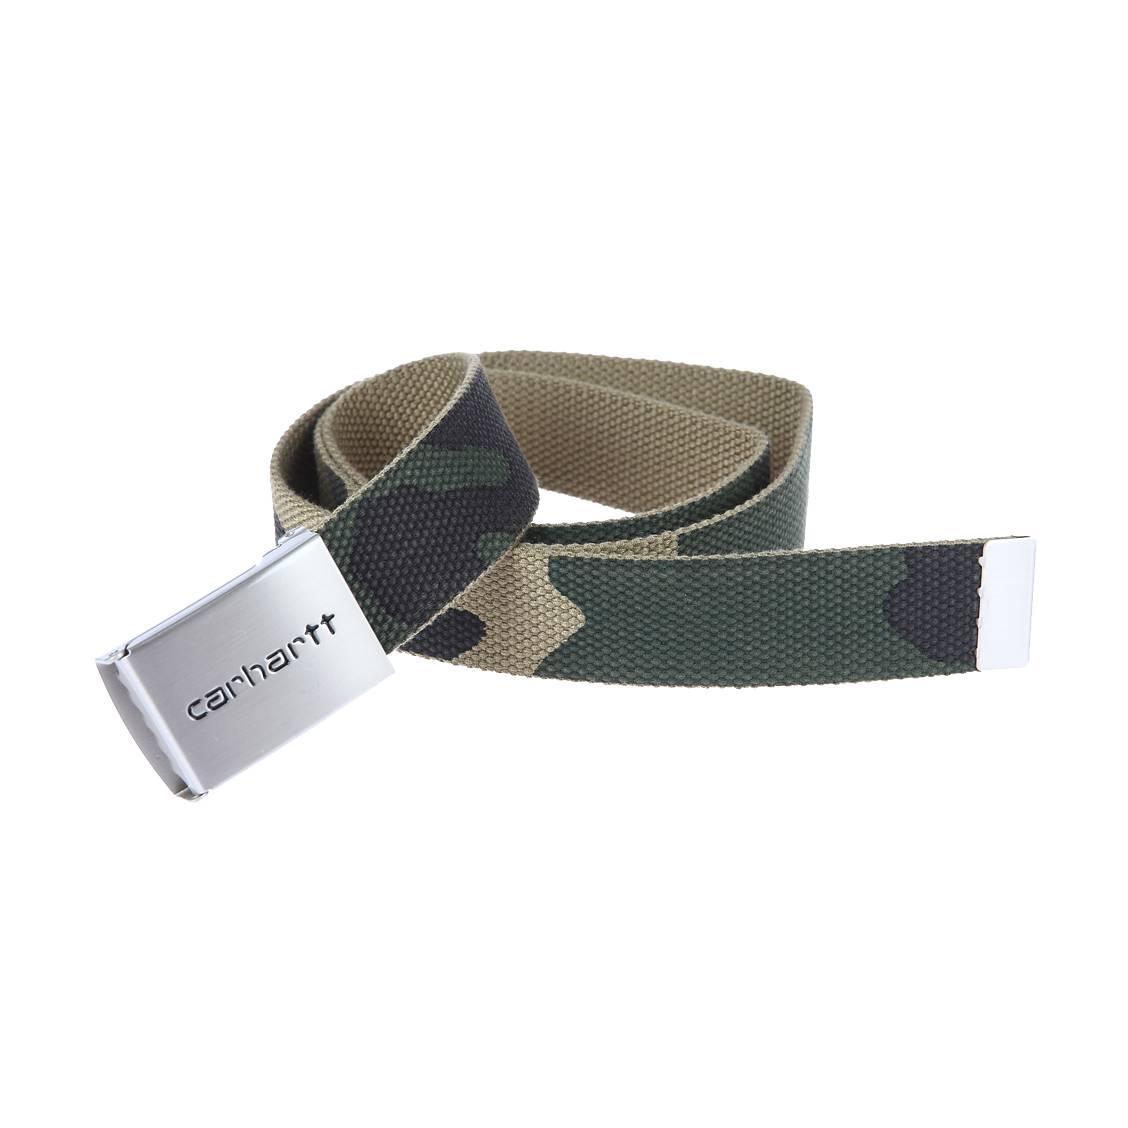 Ceinture ajustable Carhartt WIP Clip Belt Chrome à imprimé camouflage 2a5221e9194